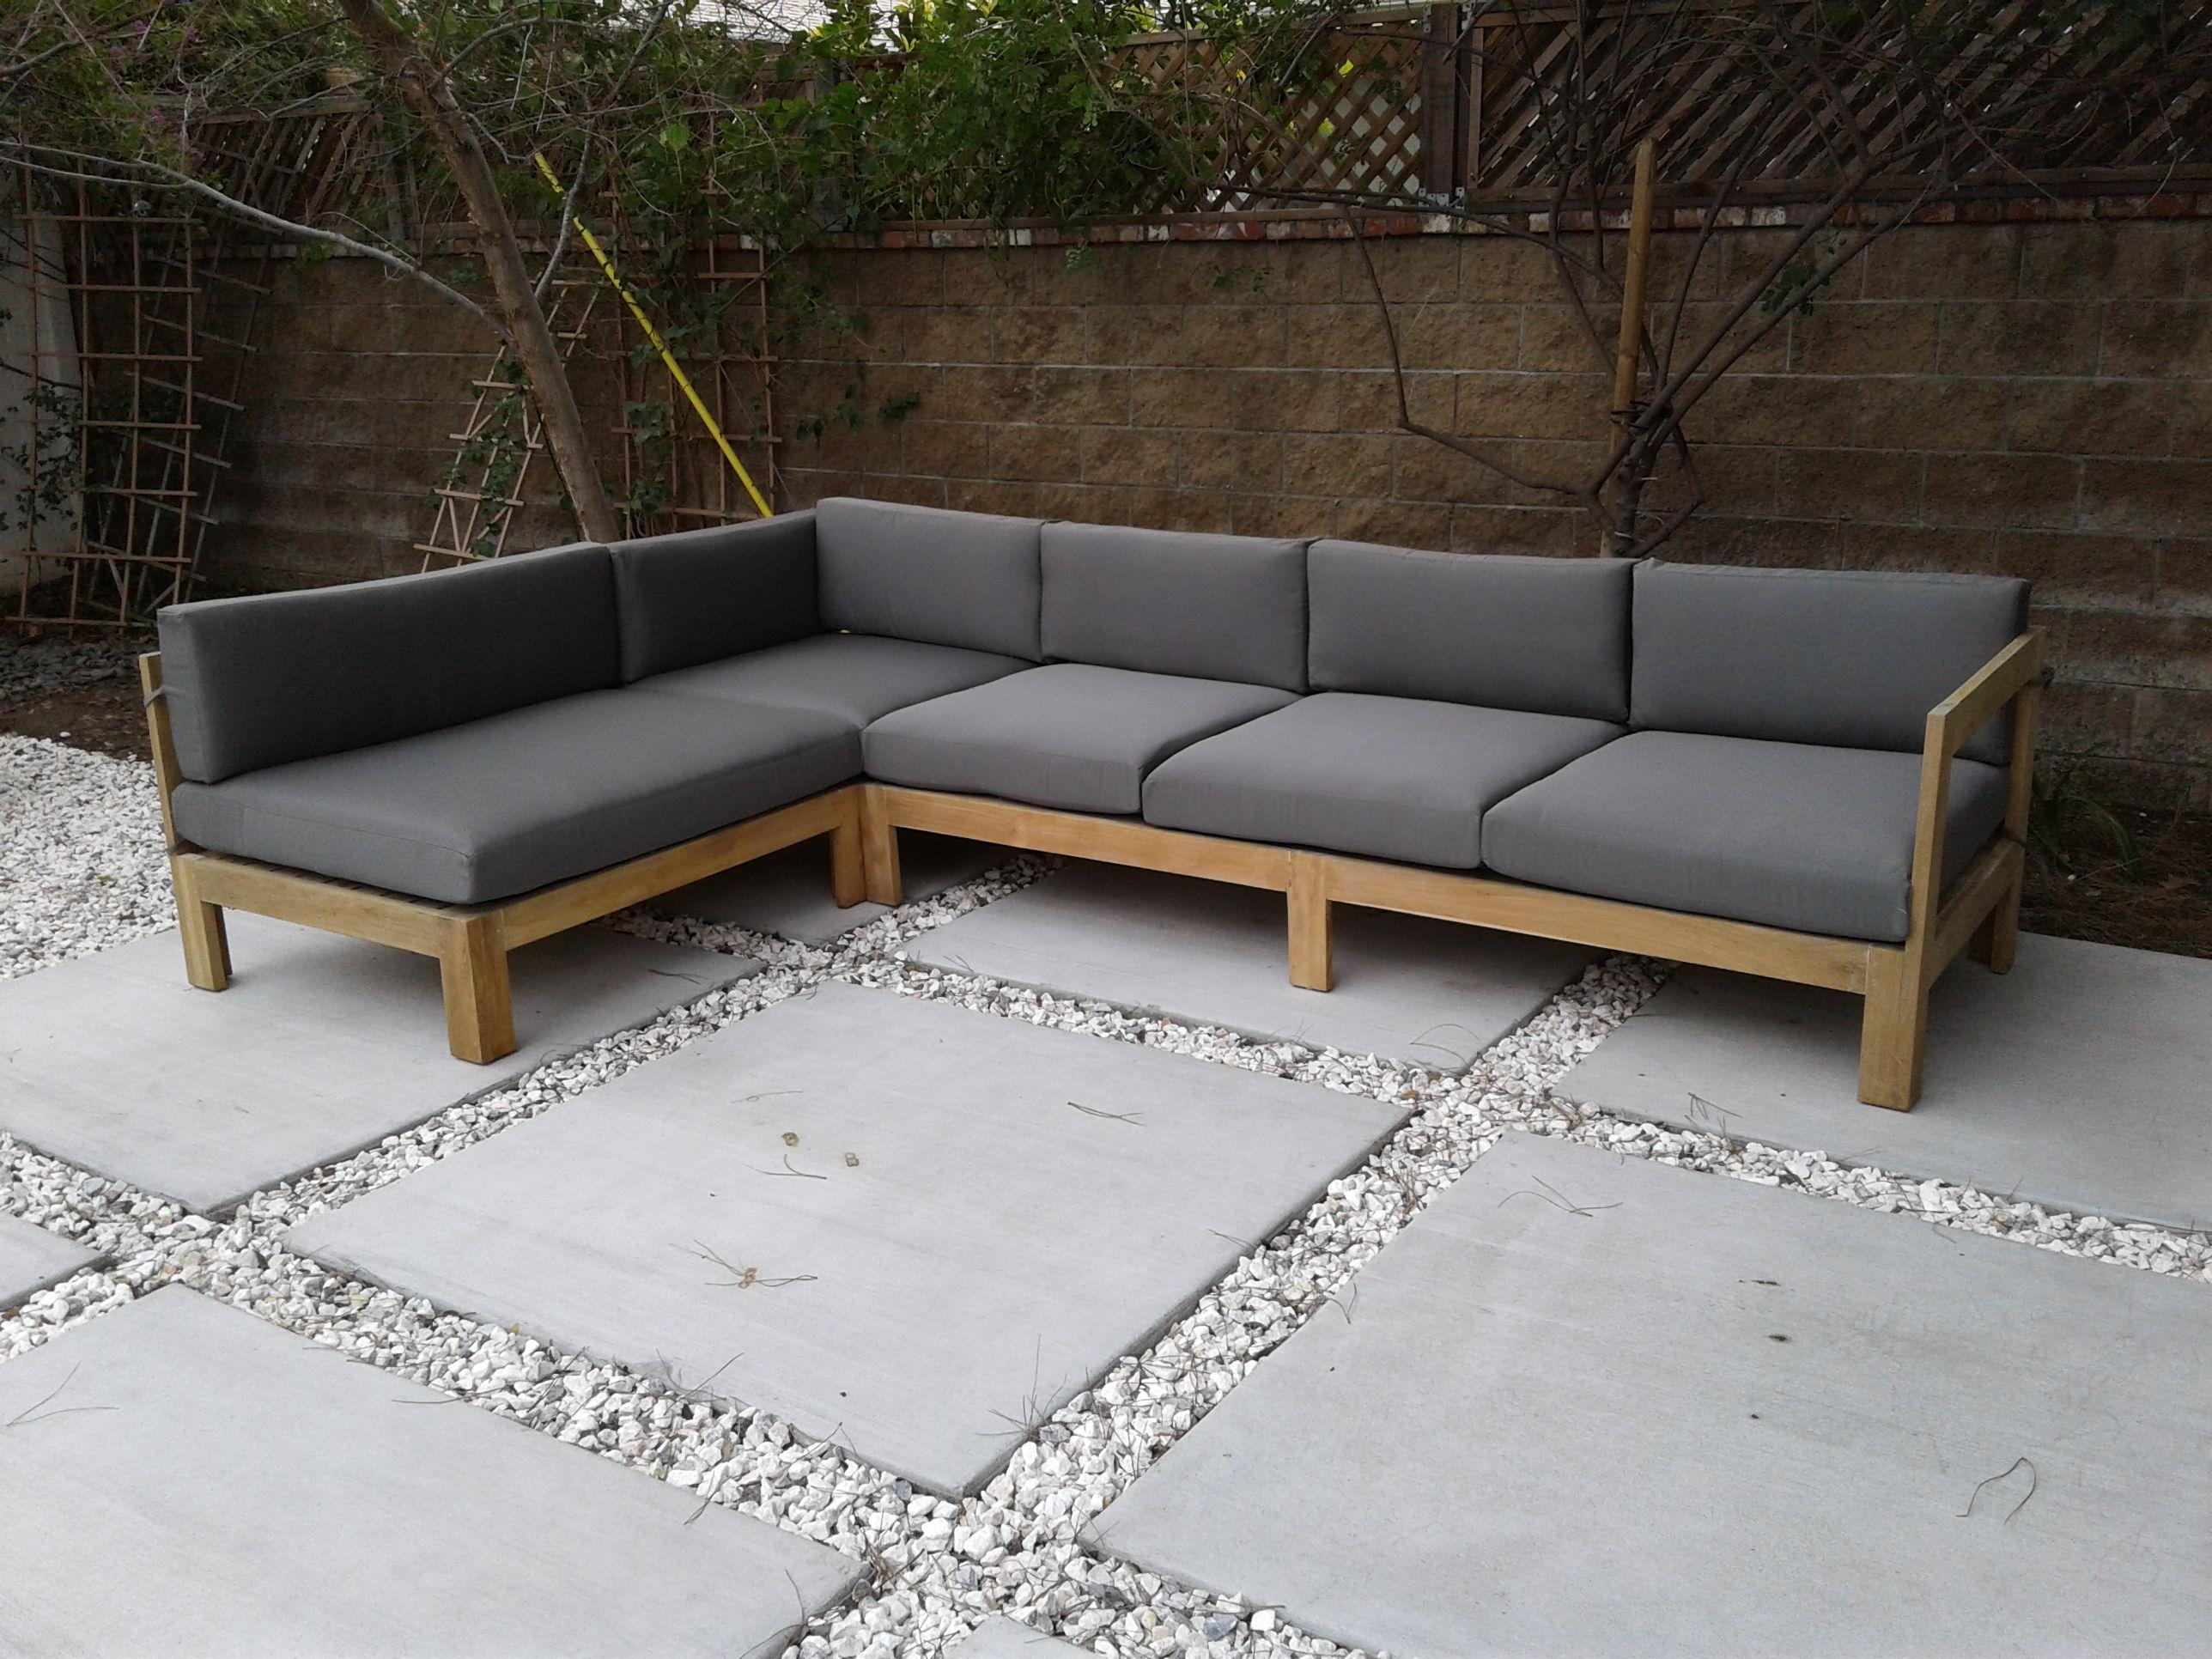 Teak Patio Furniture Los Angeles Wholesaler In Woodland Hills, CA. We  Accept Custom Order On Teak Furnitures And Cushions